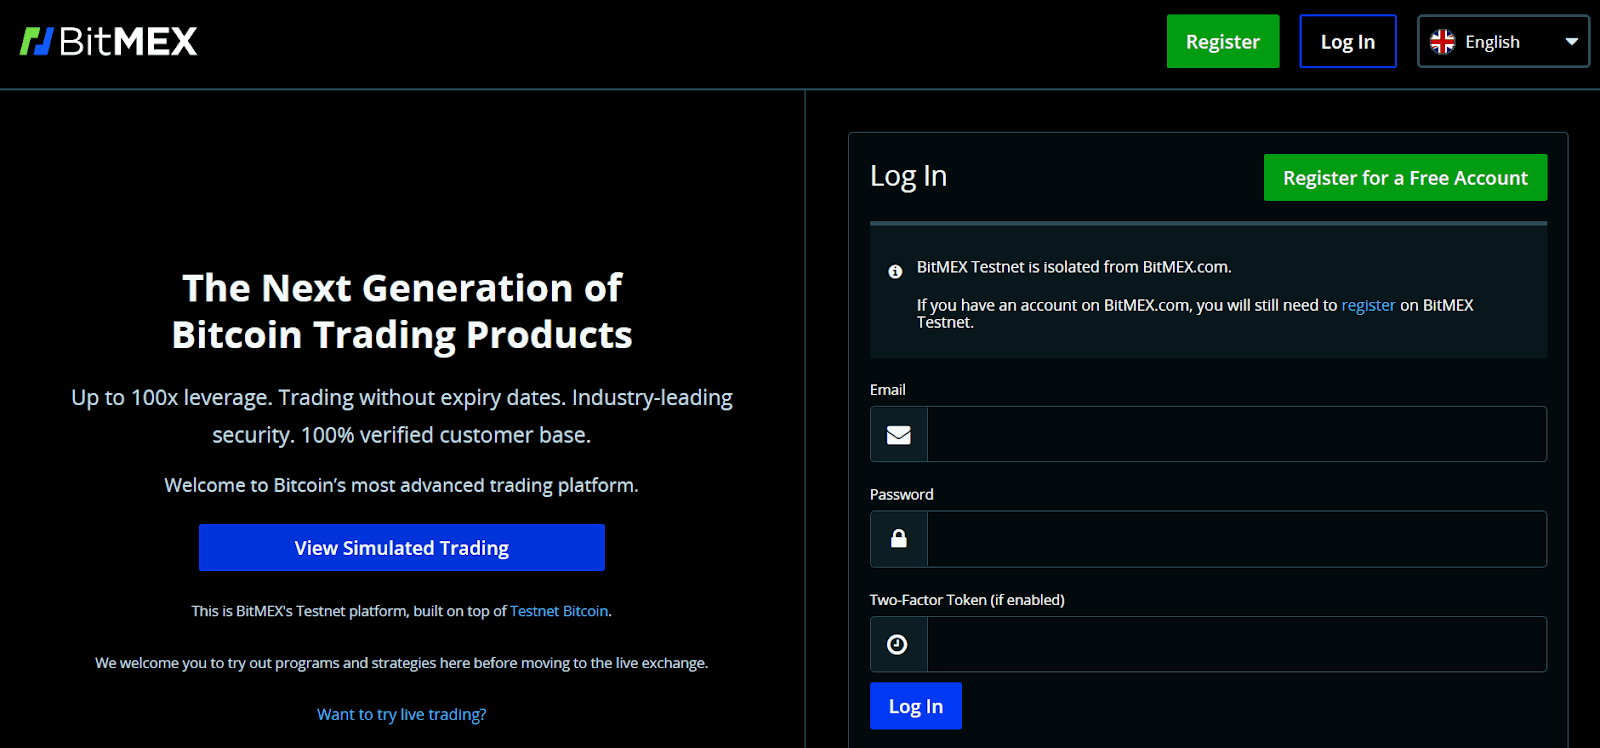 BitMEX Testnet